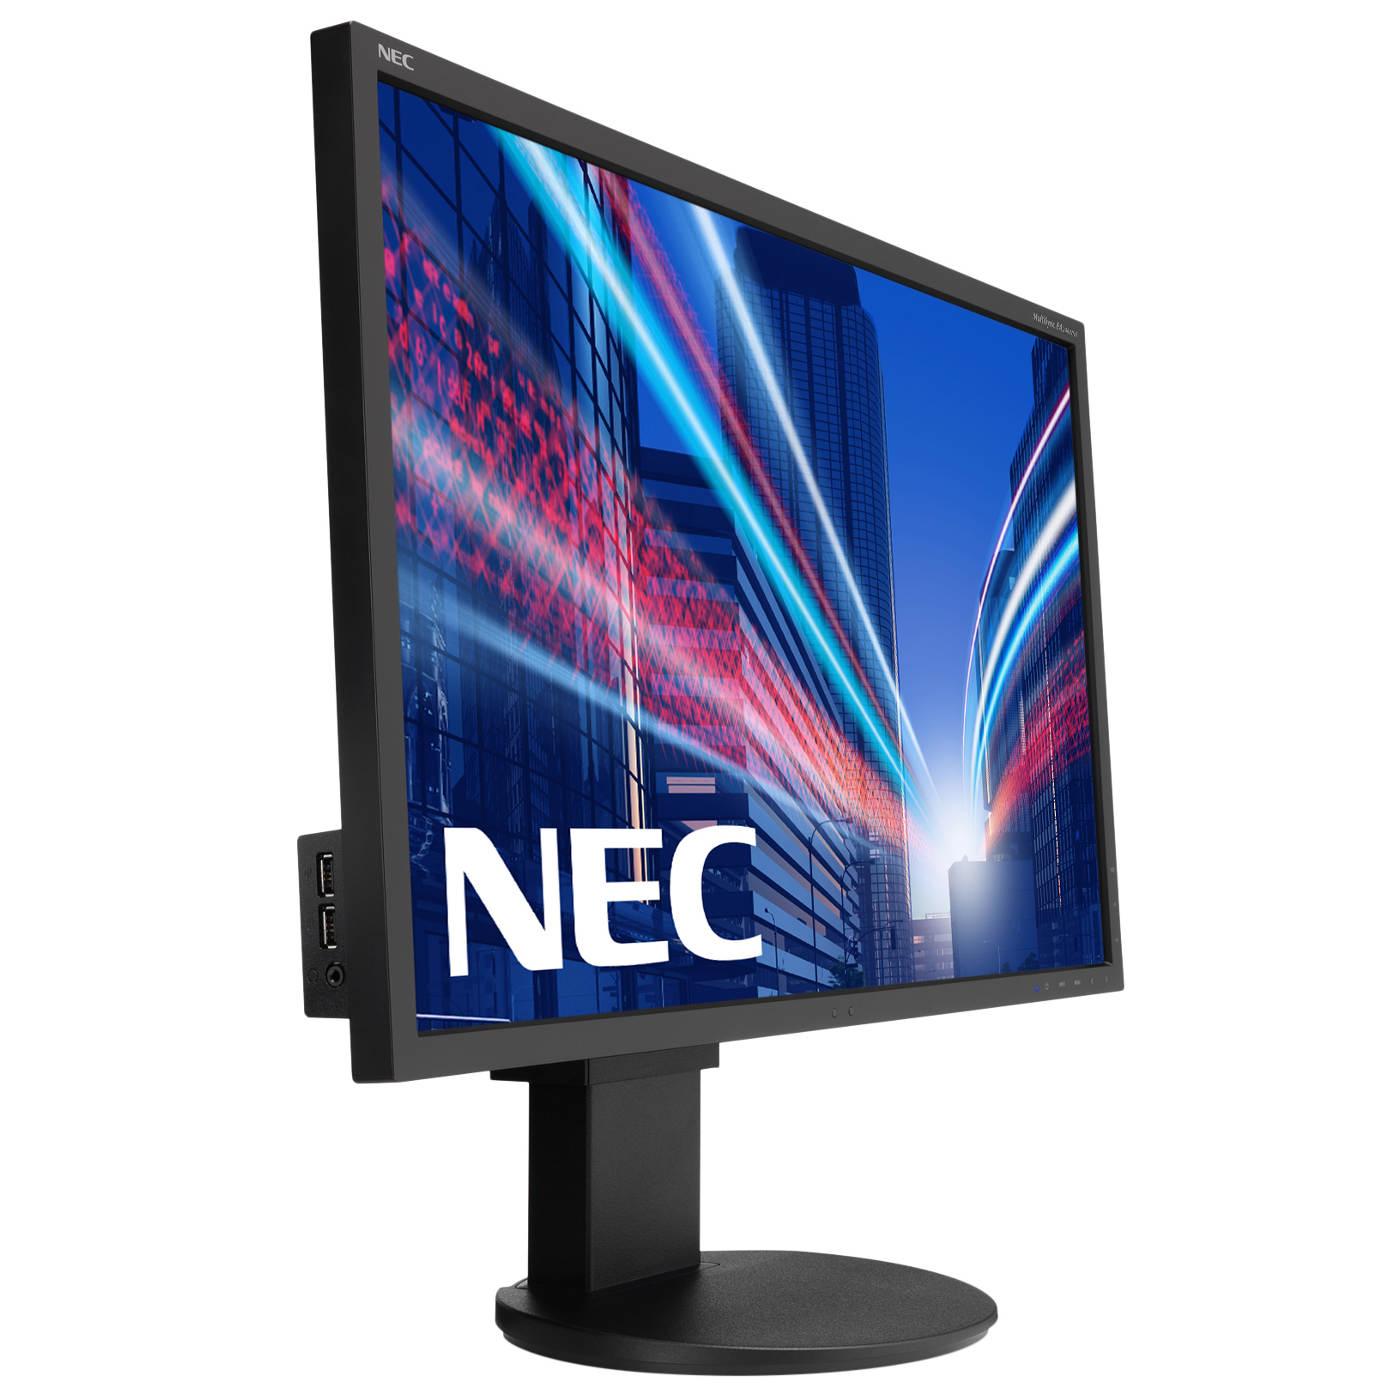 Nec 24 1 led multisync ea244wmi ecran pc nec sur for Ecran photo nec